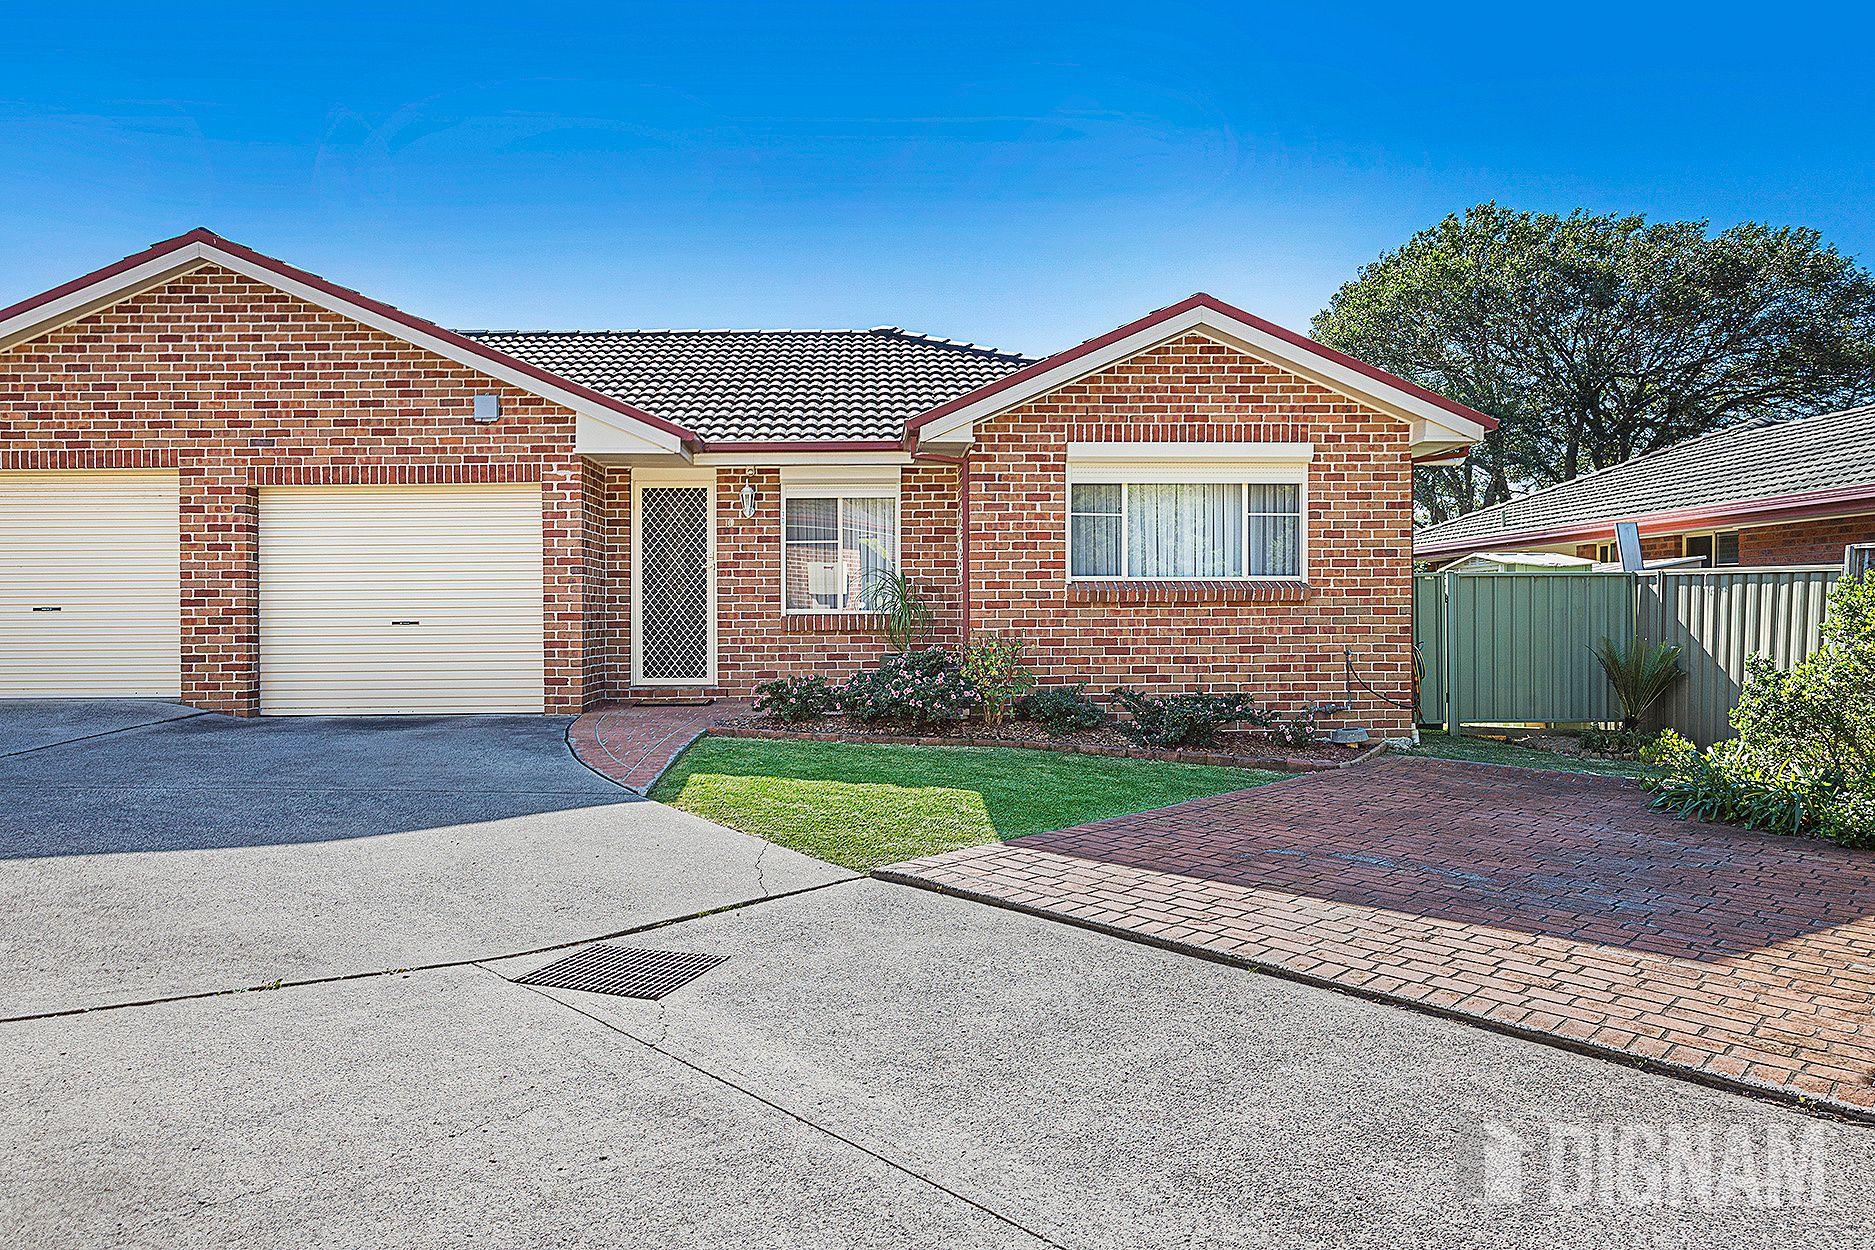 10/38-40 Duke Street, Woonona NSW